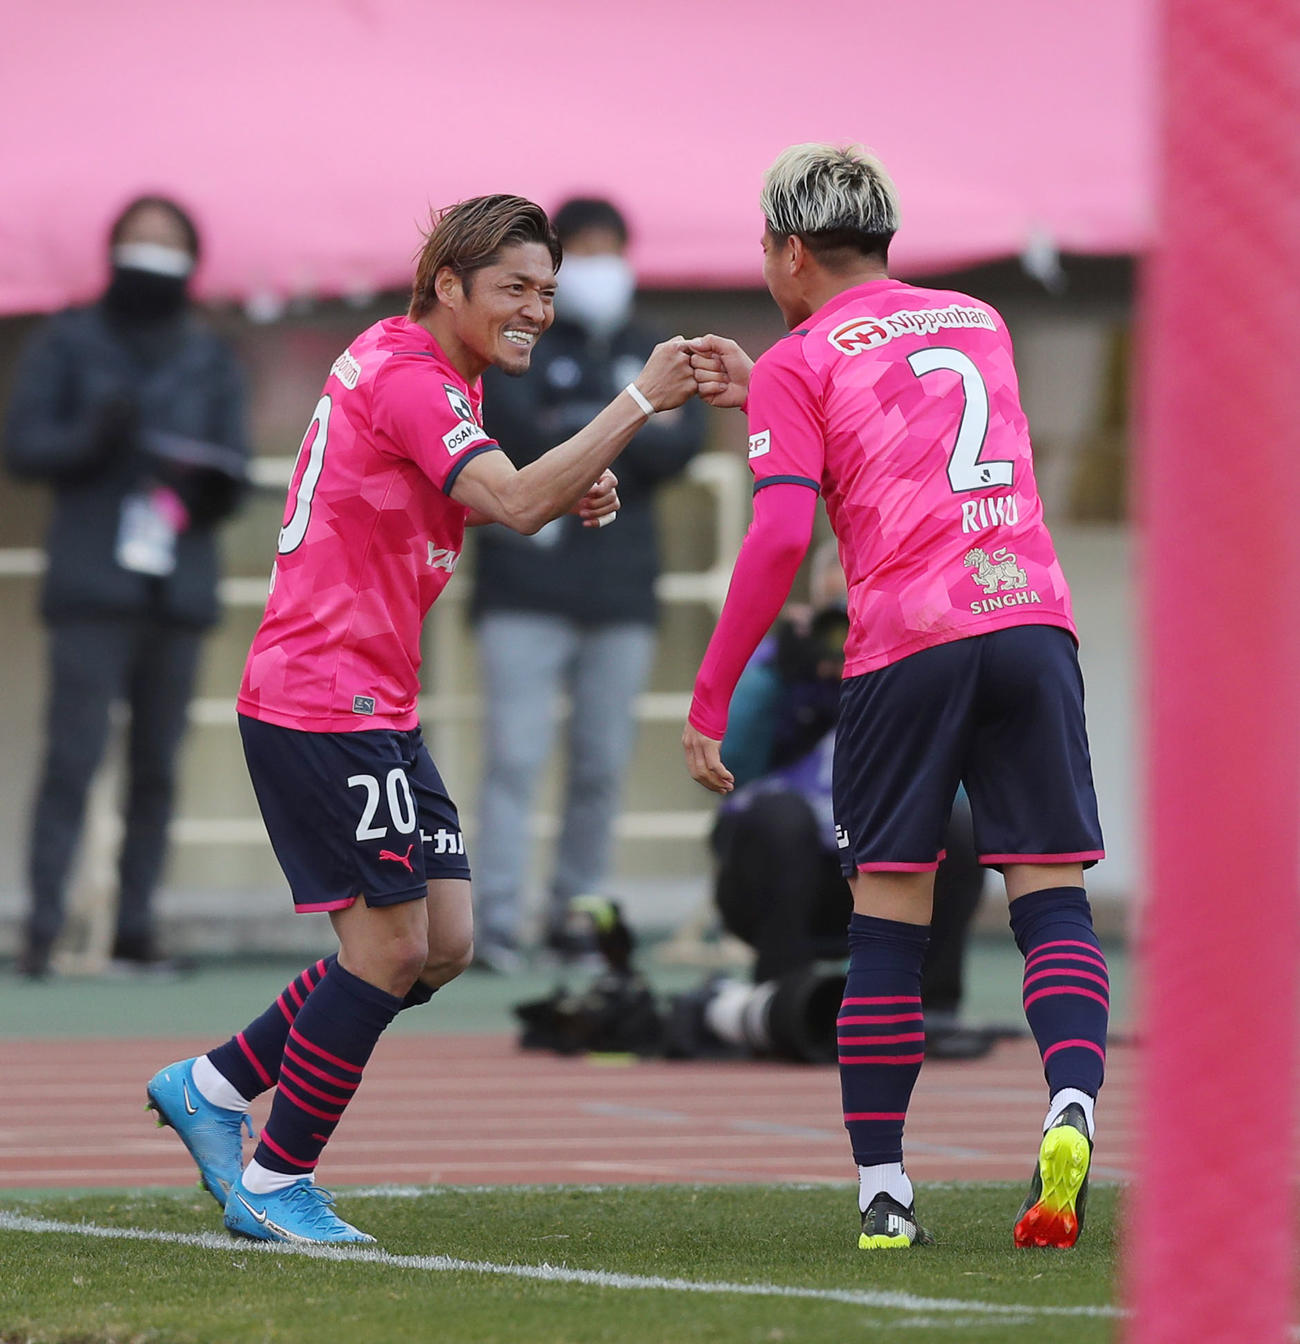 C大阪対柏 前半、先制ゴールを決めたC大阪FW大久保(左)はアシストしたDF松田陸と笑顔でグータッチ(撮影・前田充)